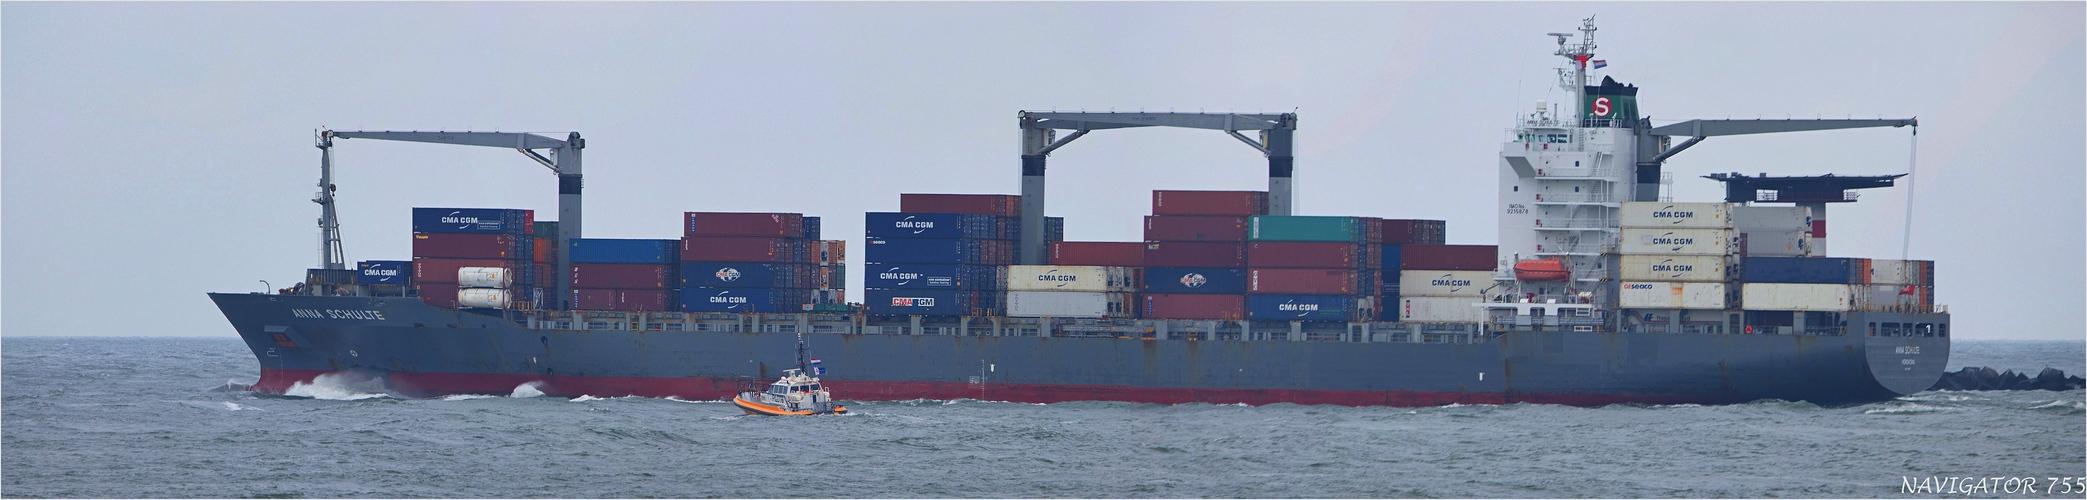 ANNA SCHULTE / Container Vessel / Rotterdam / Bitte scrollen!